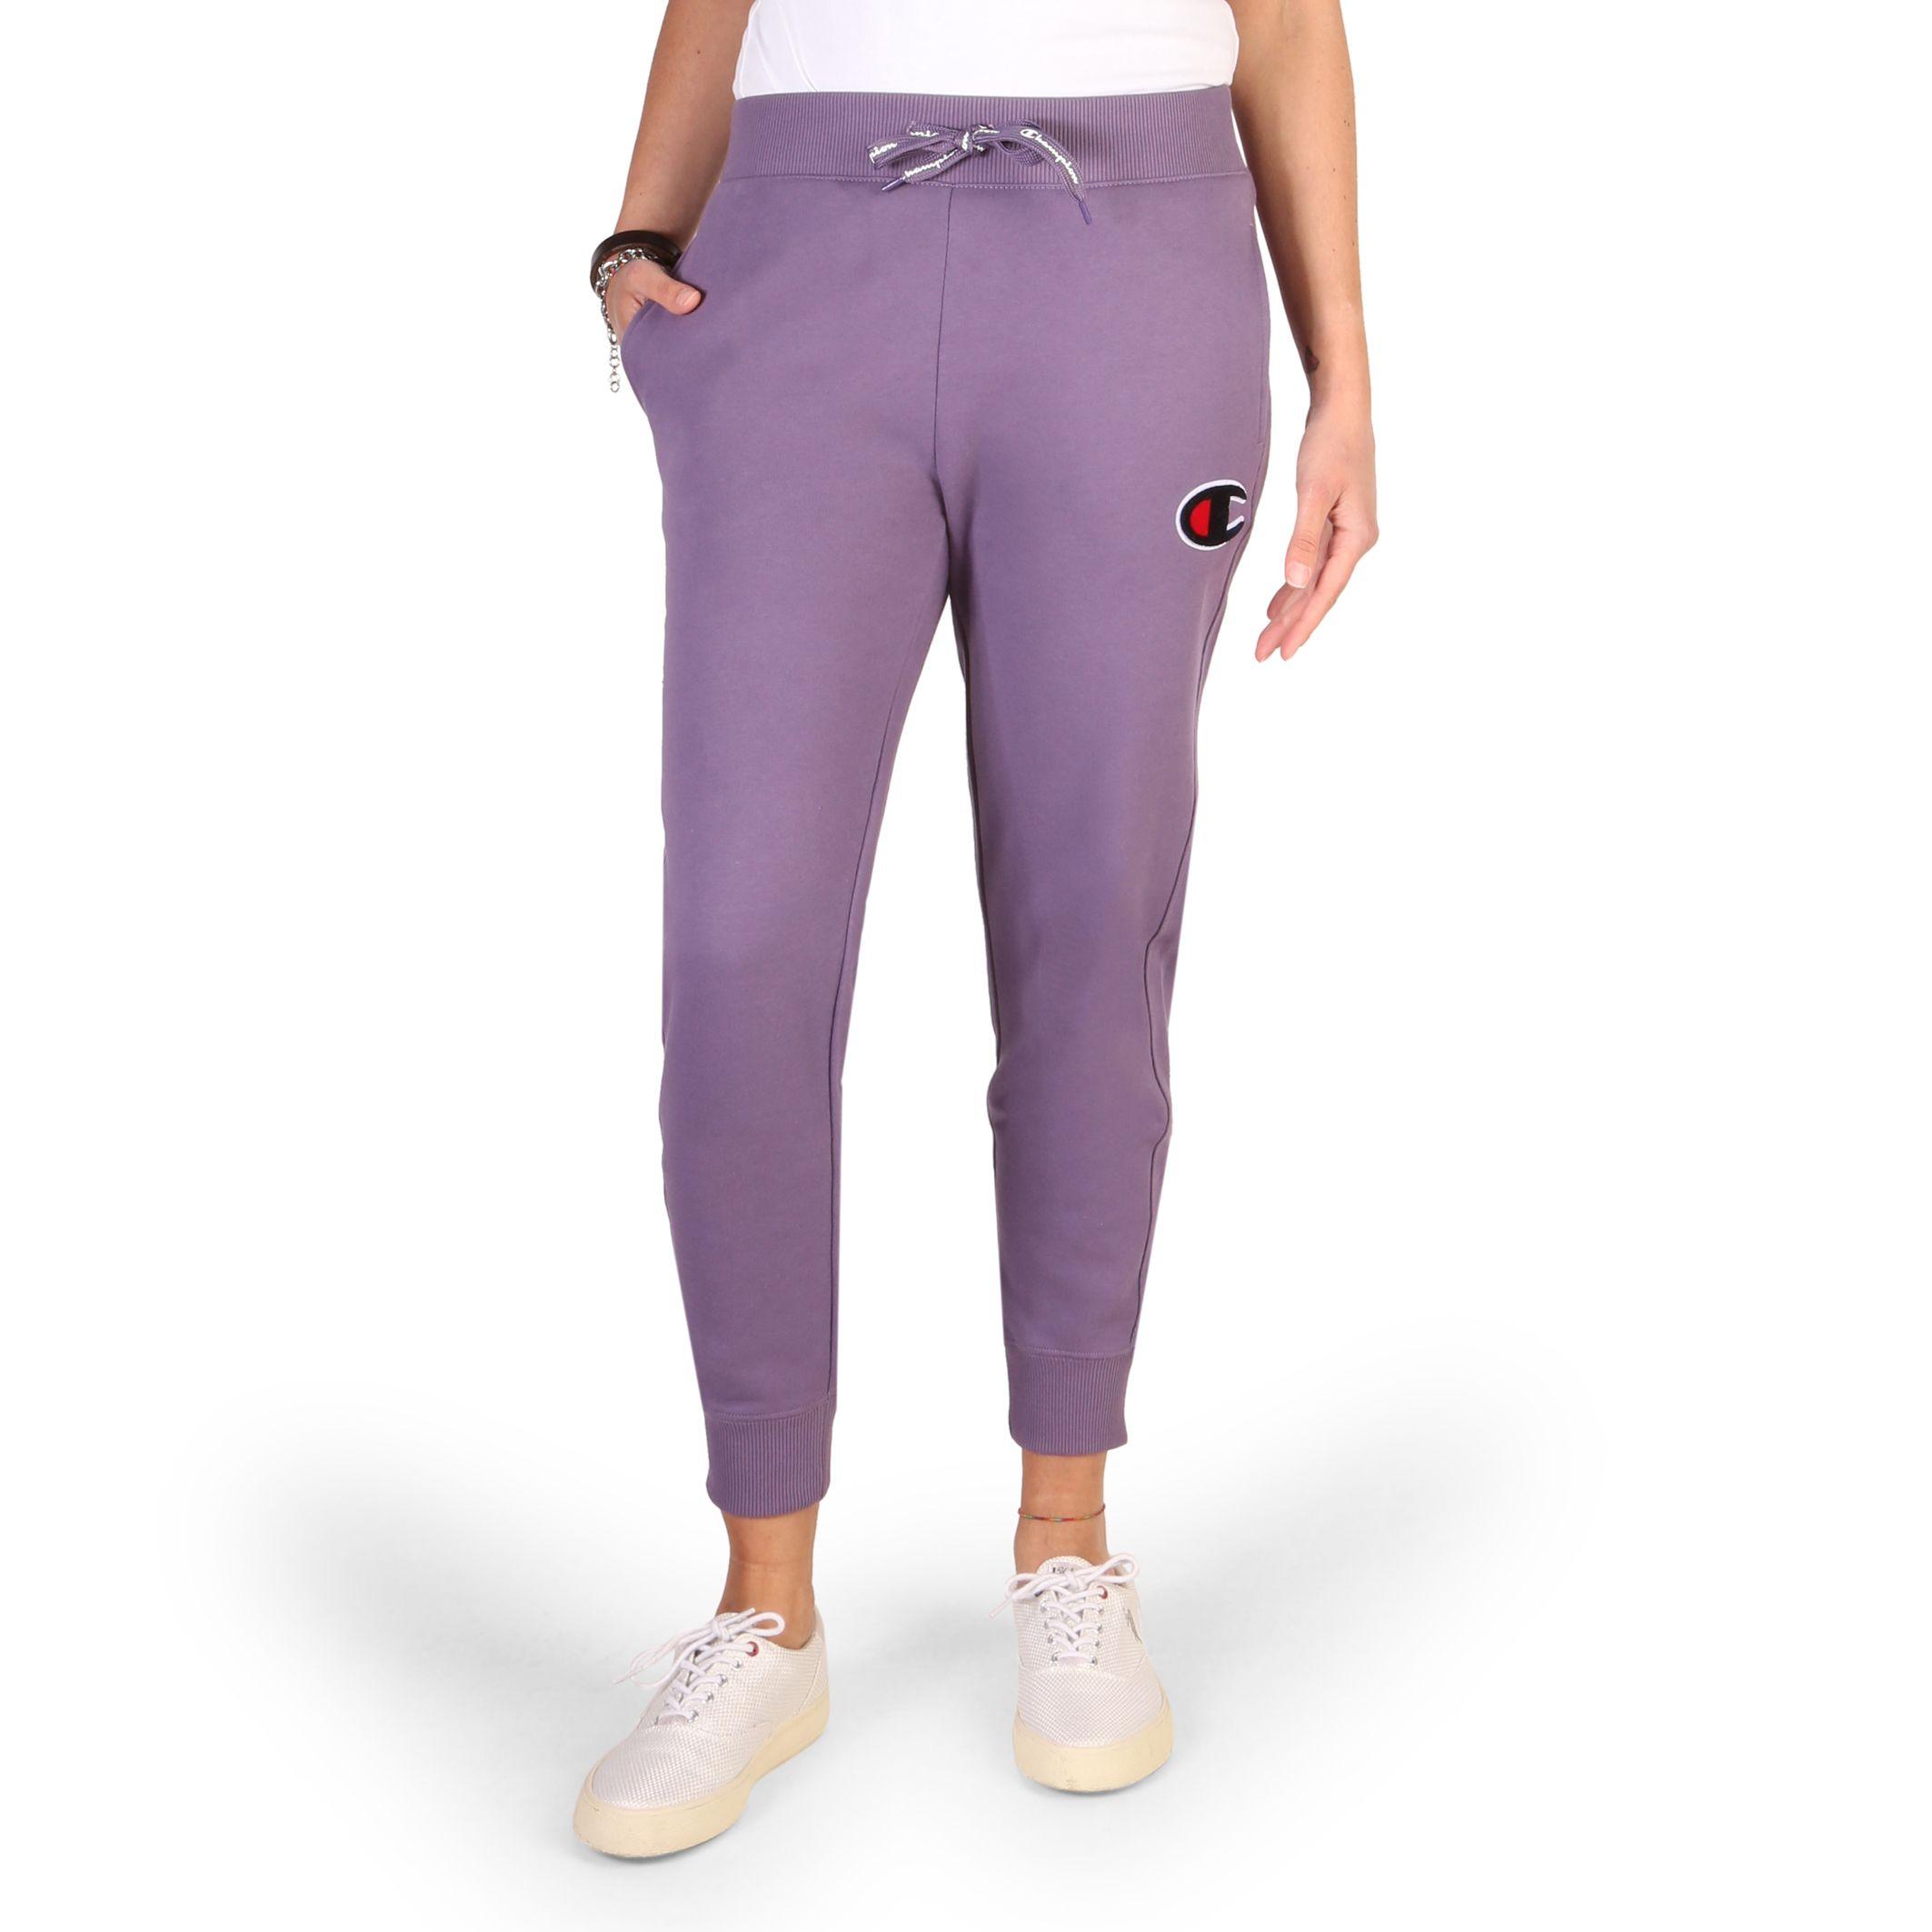 Pantalon de jogging Champion – 111969